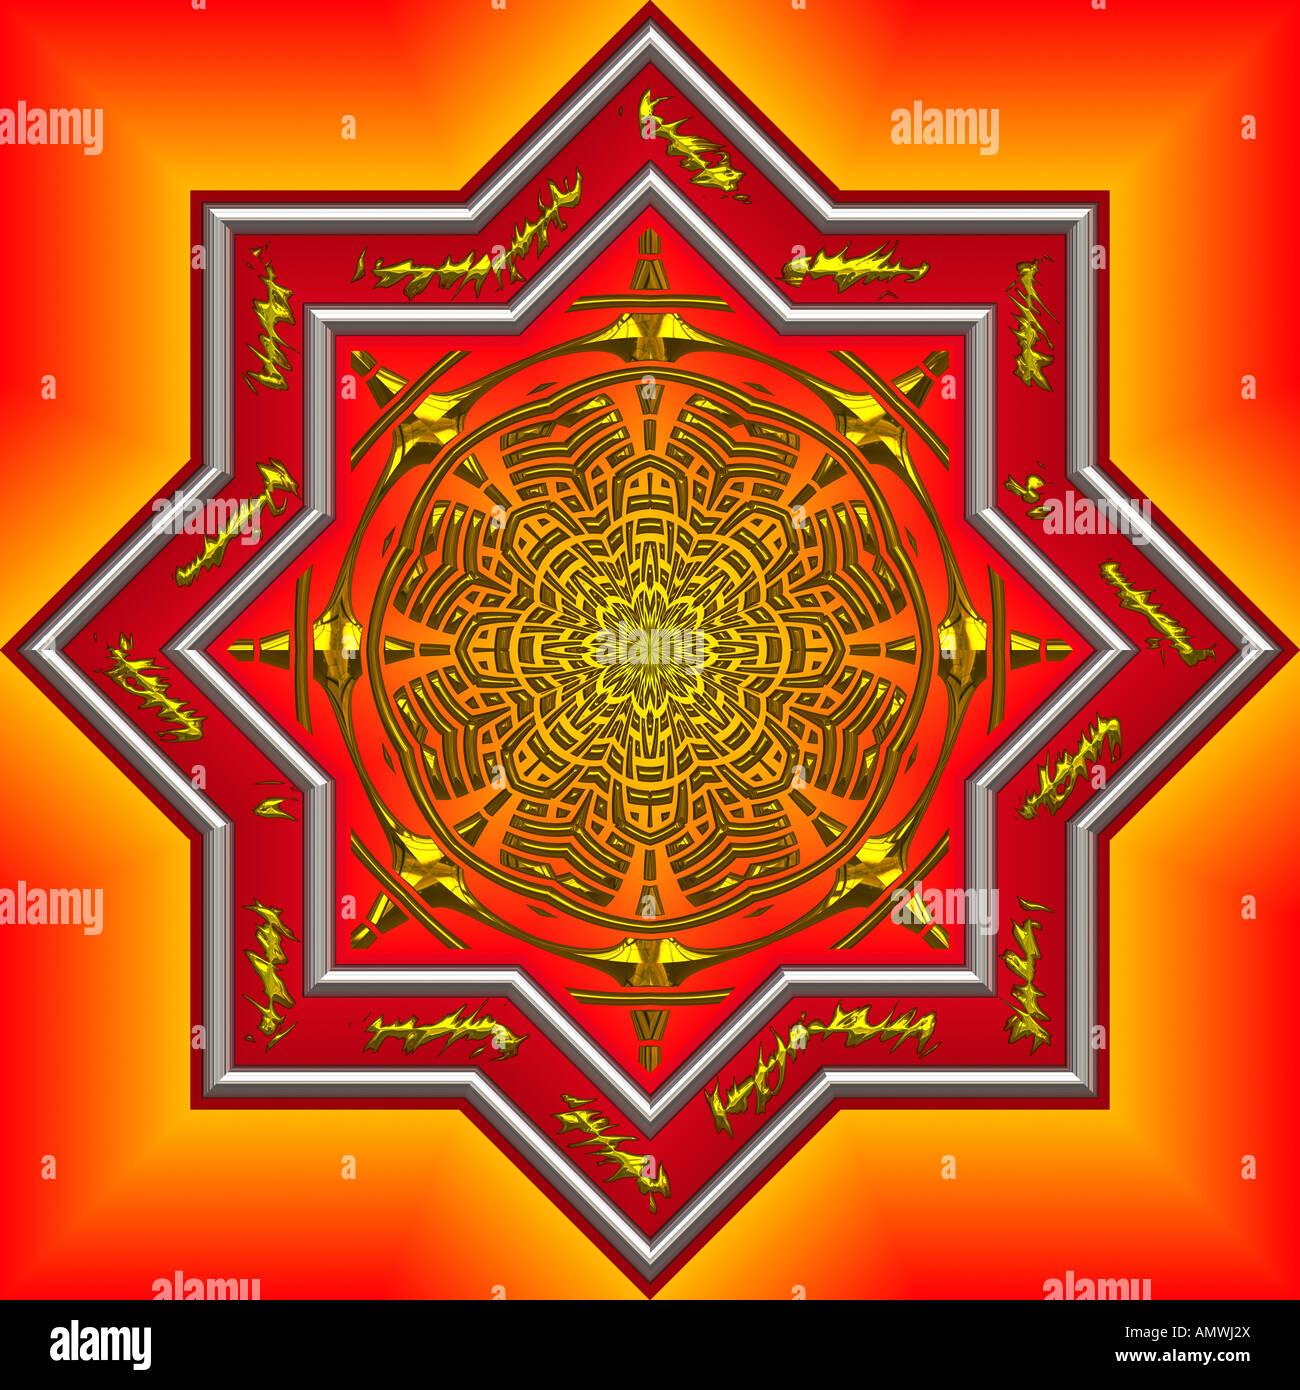 big bright and beautifully intrique mandala design - Stock Image